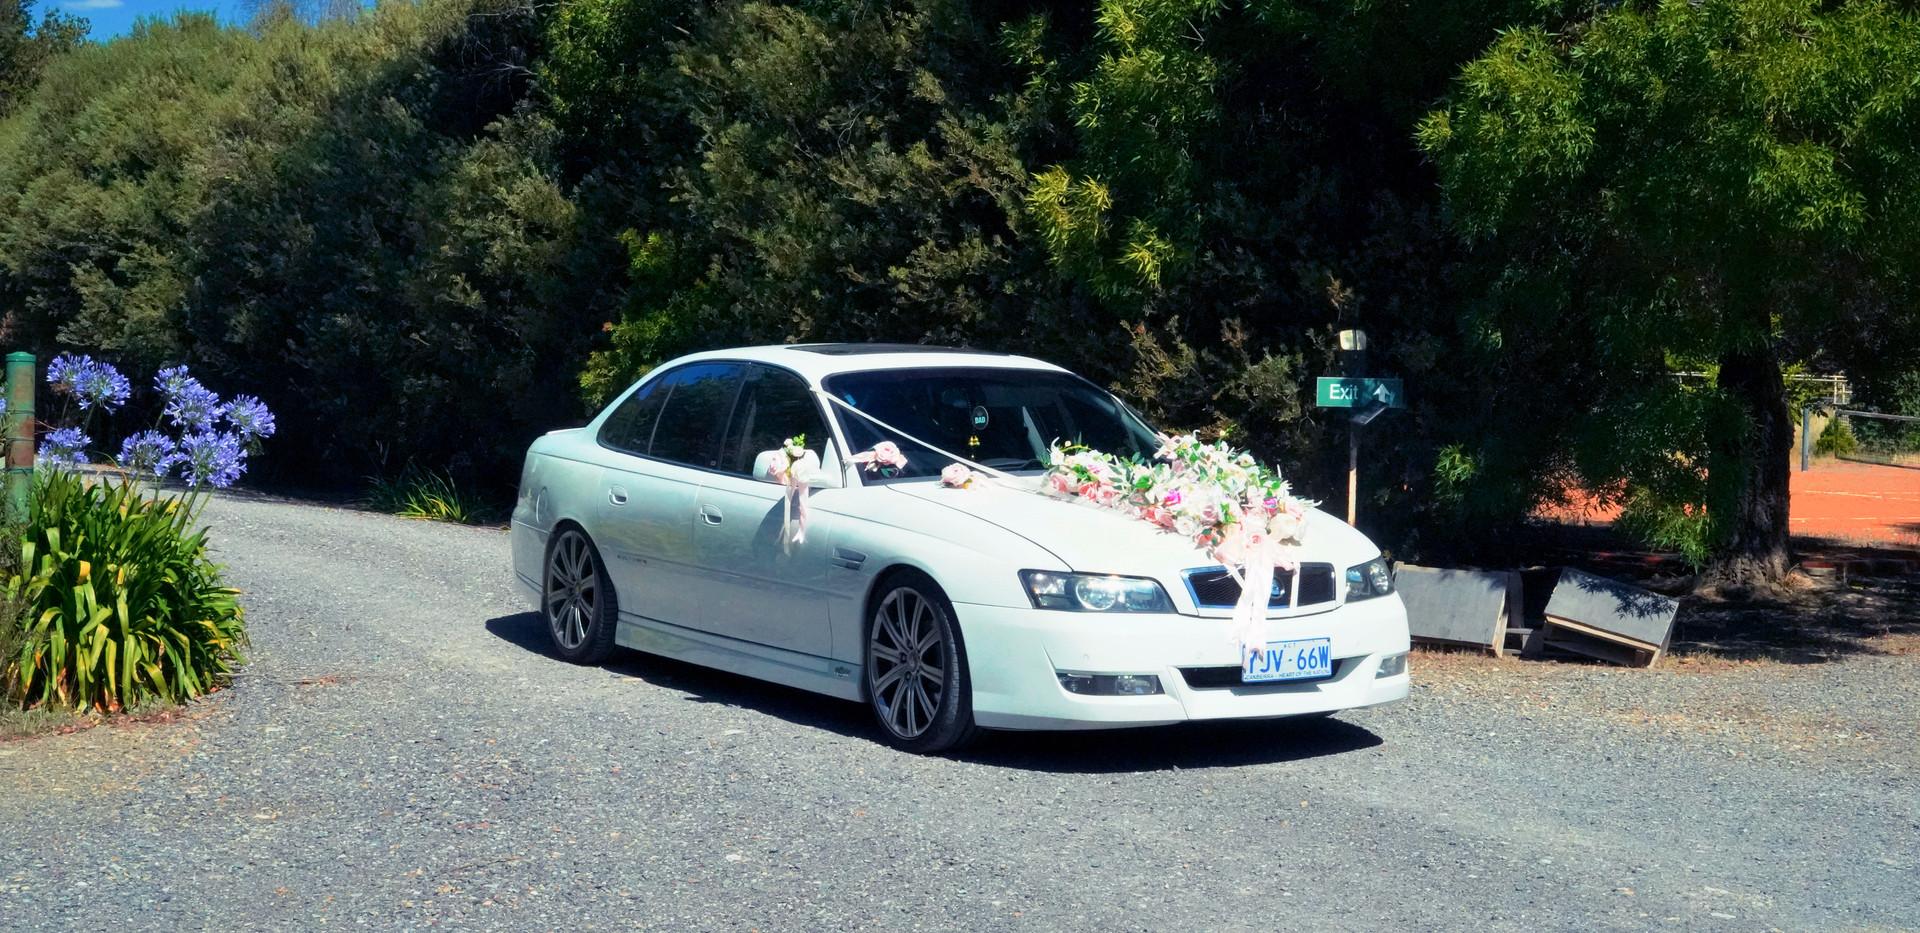 rebrowgarden_weddingcar2.JPG